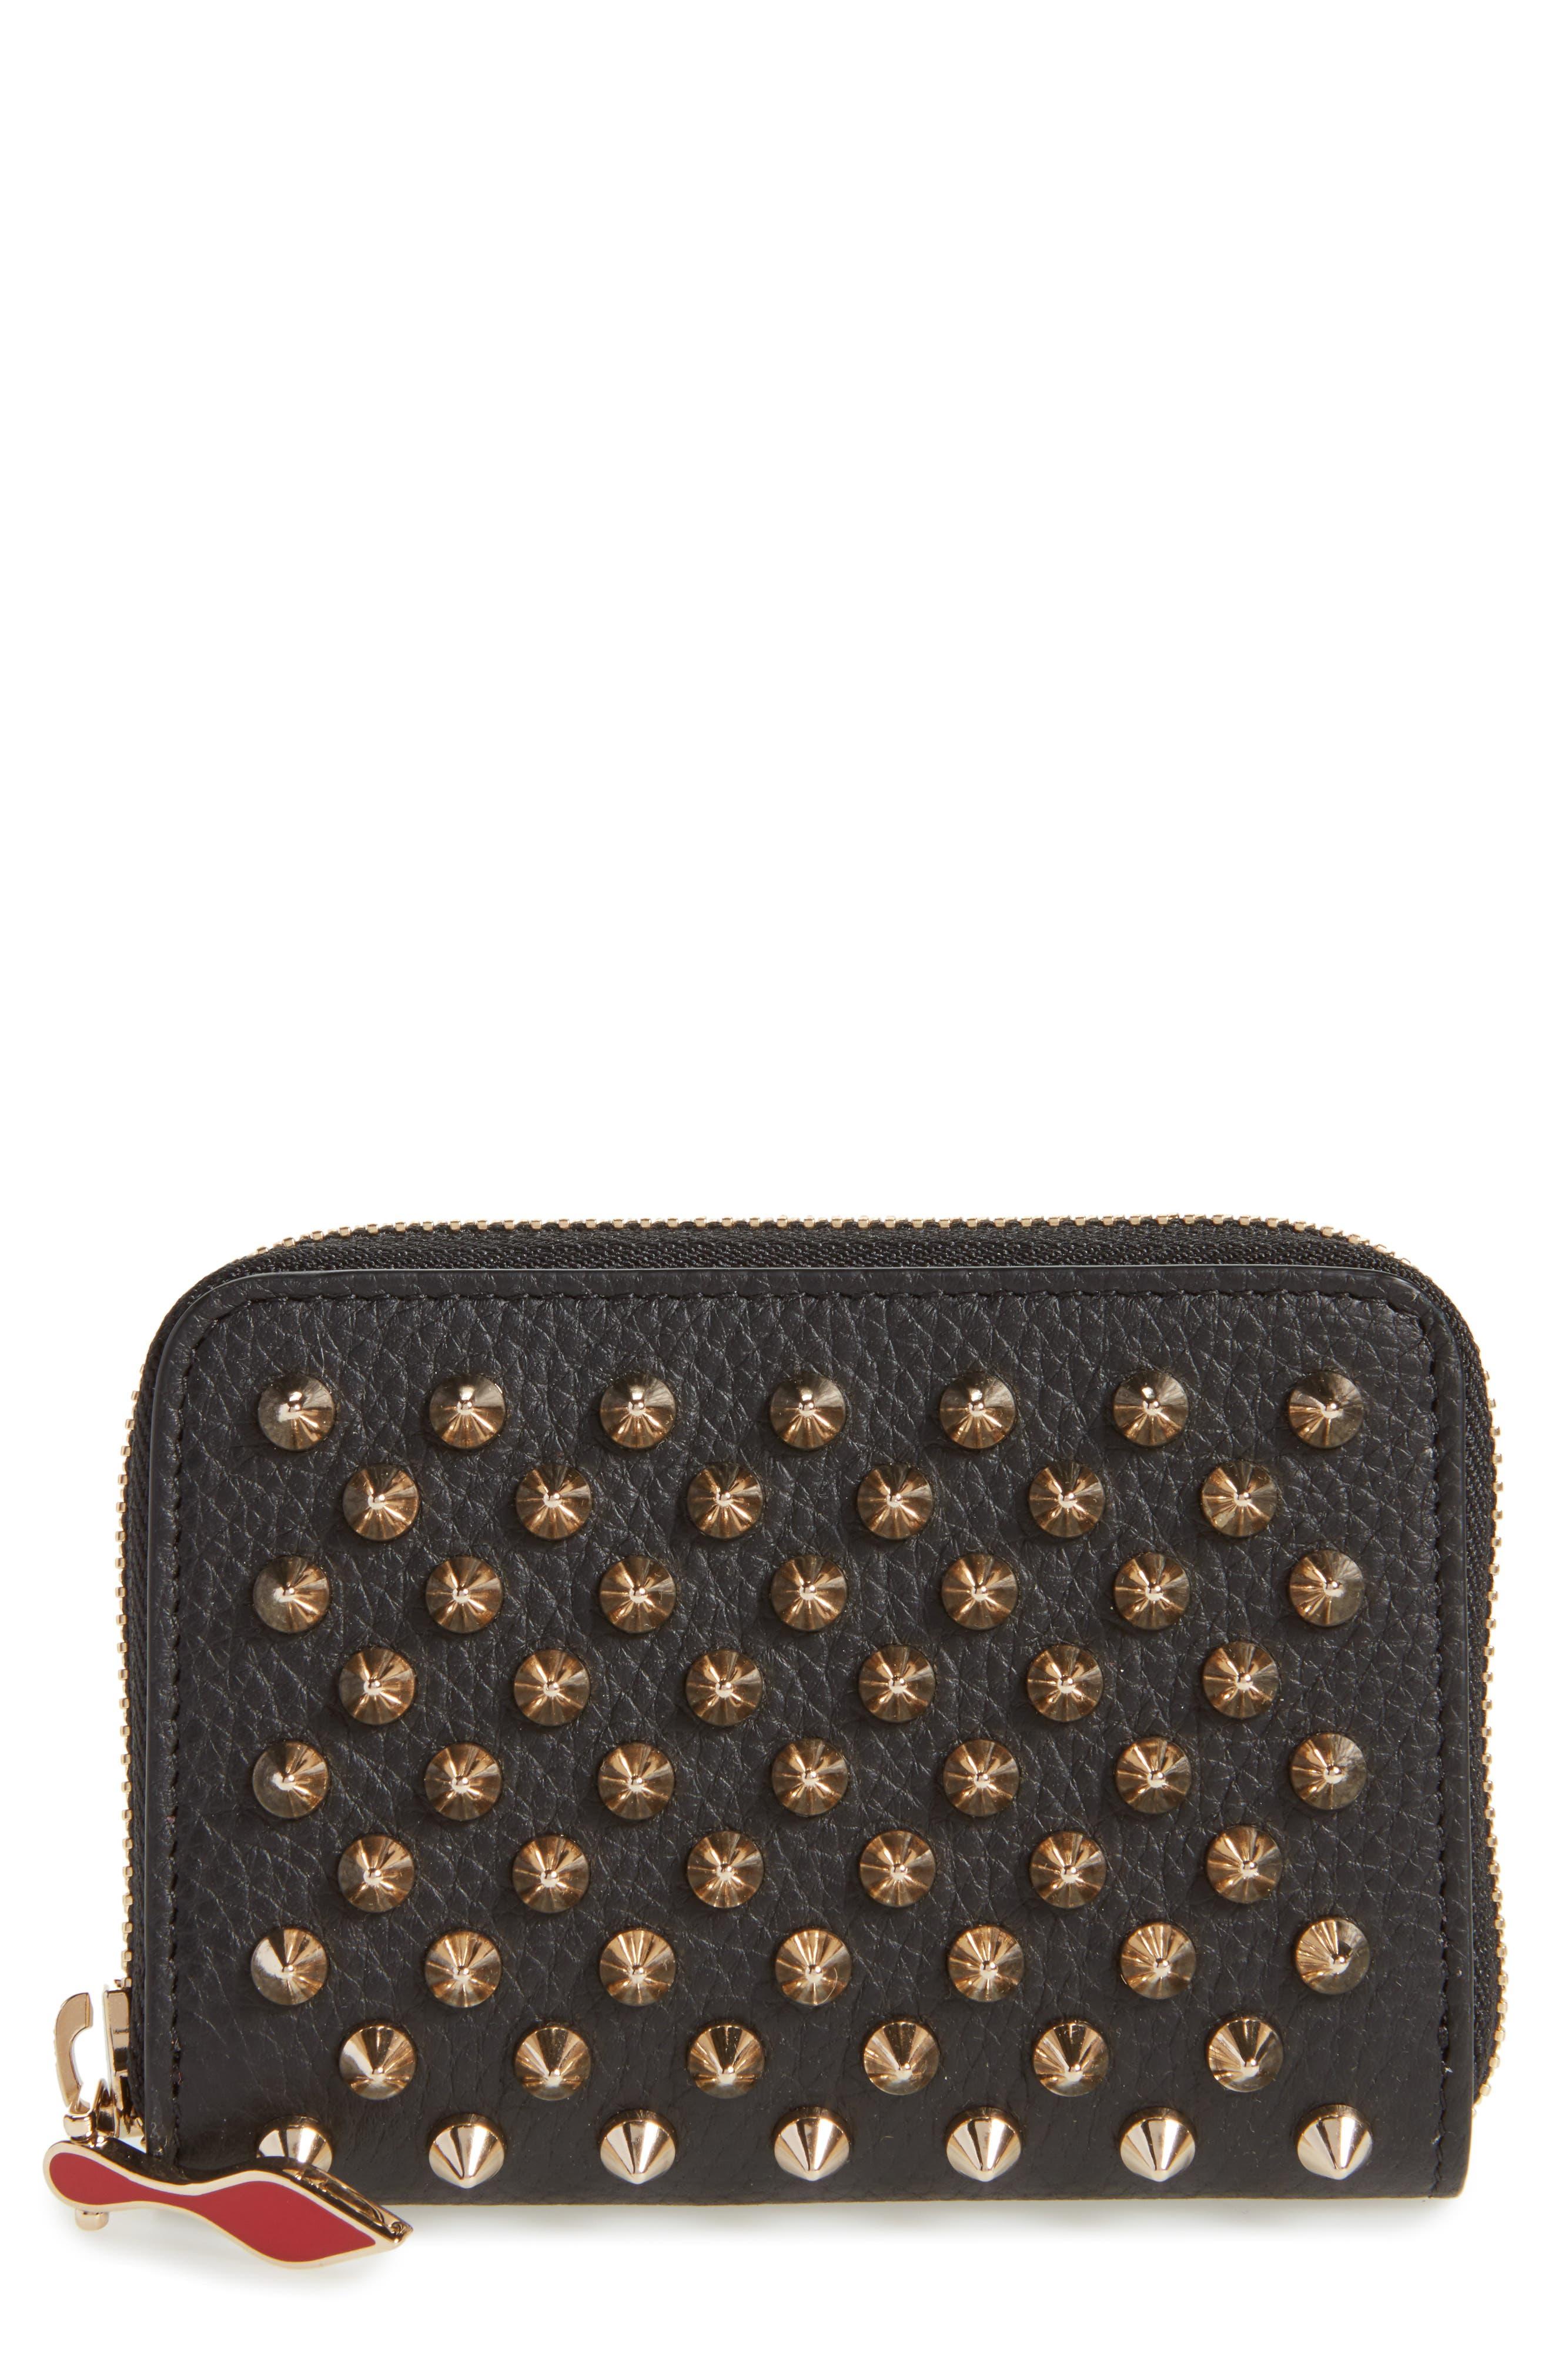 Christian Louboutin Panettone Leather Coin Purse